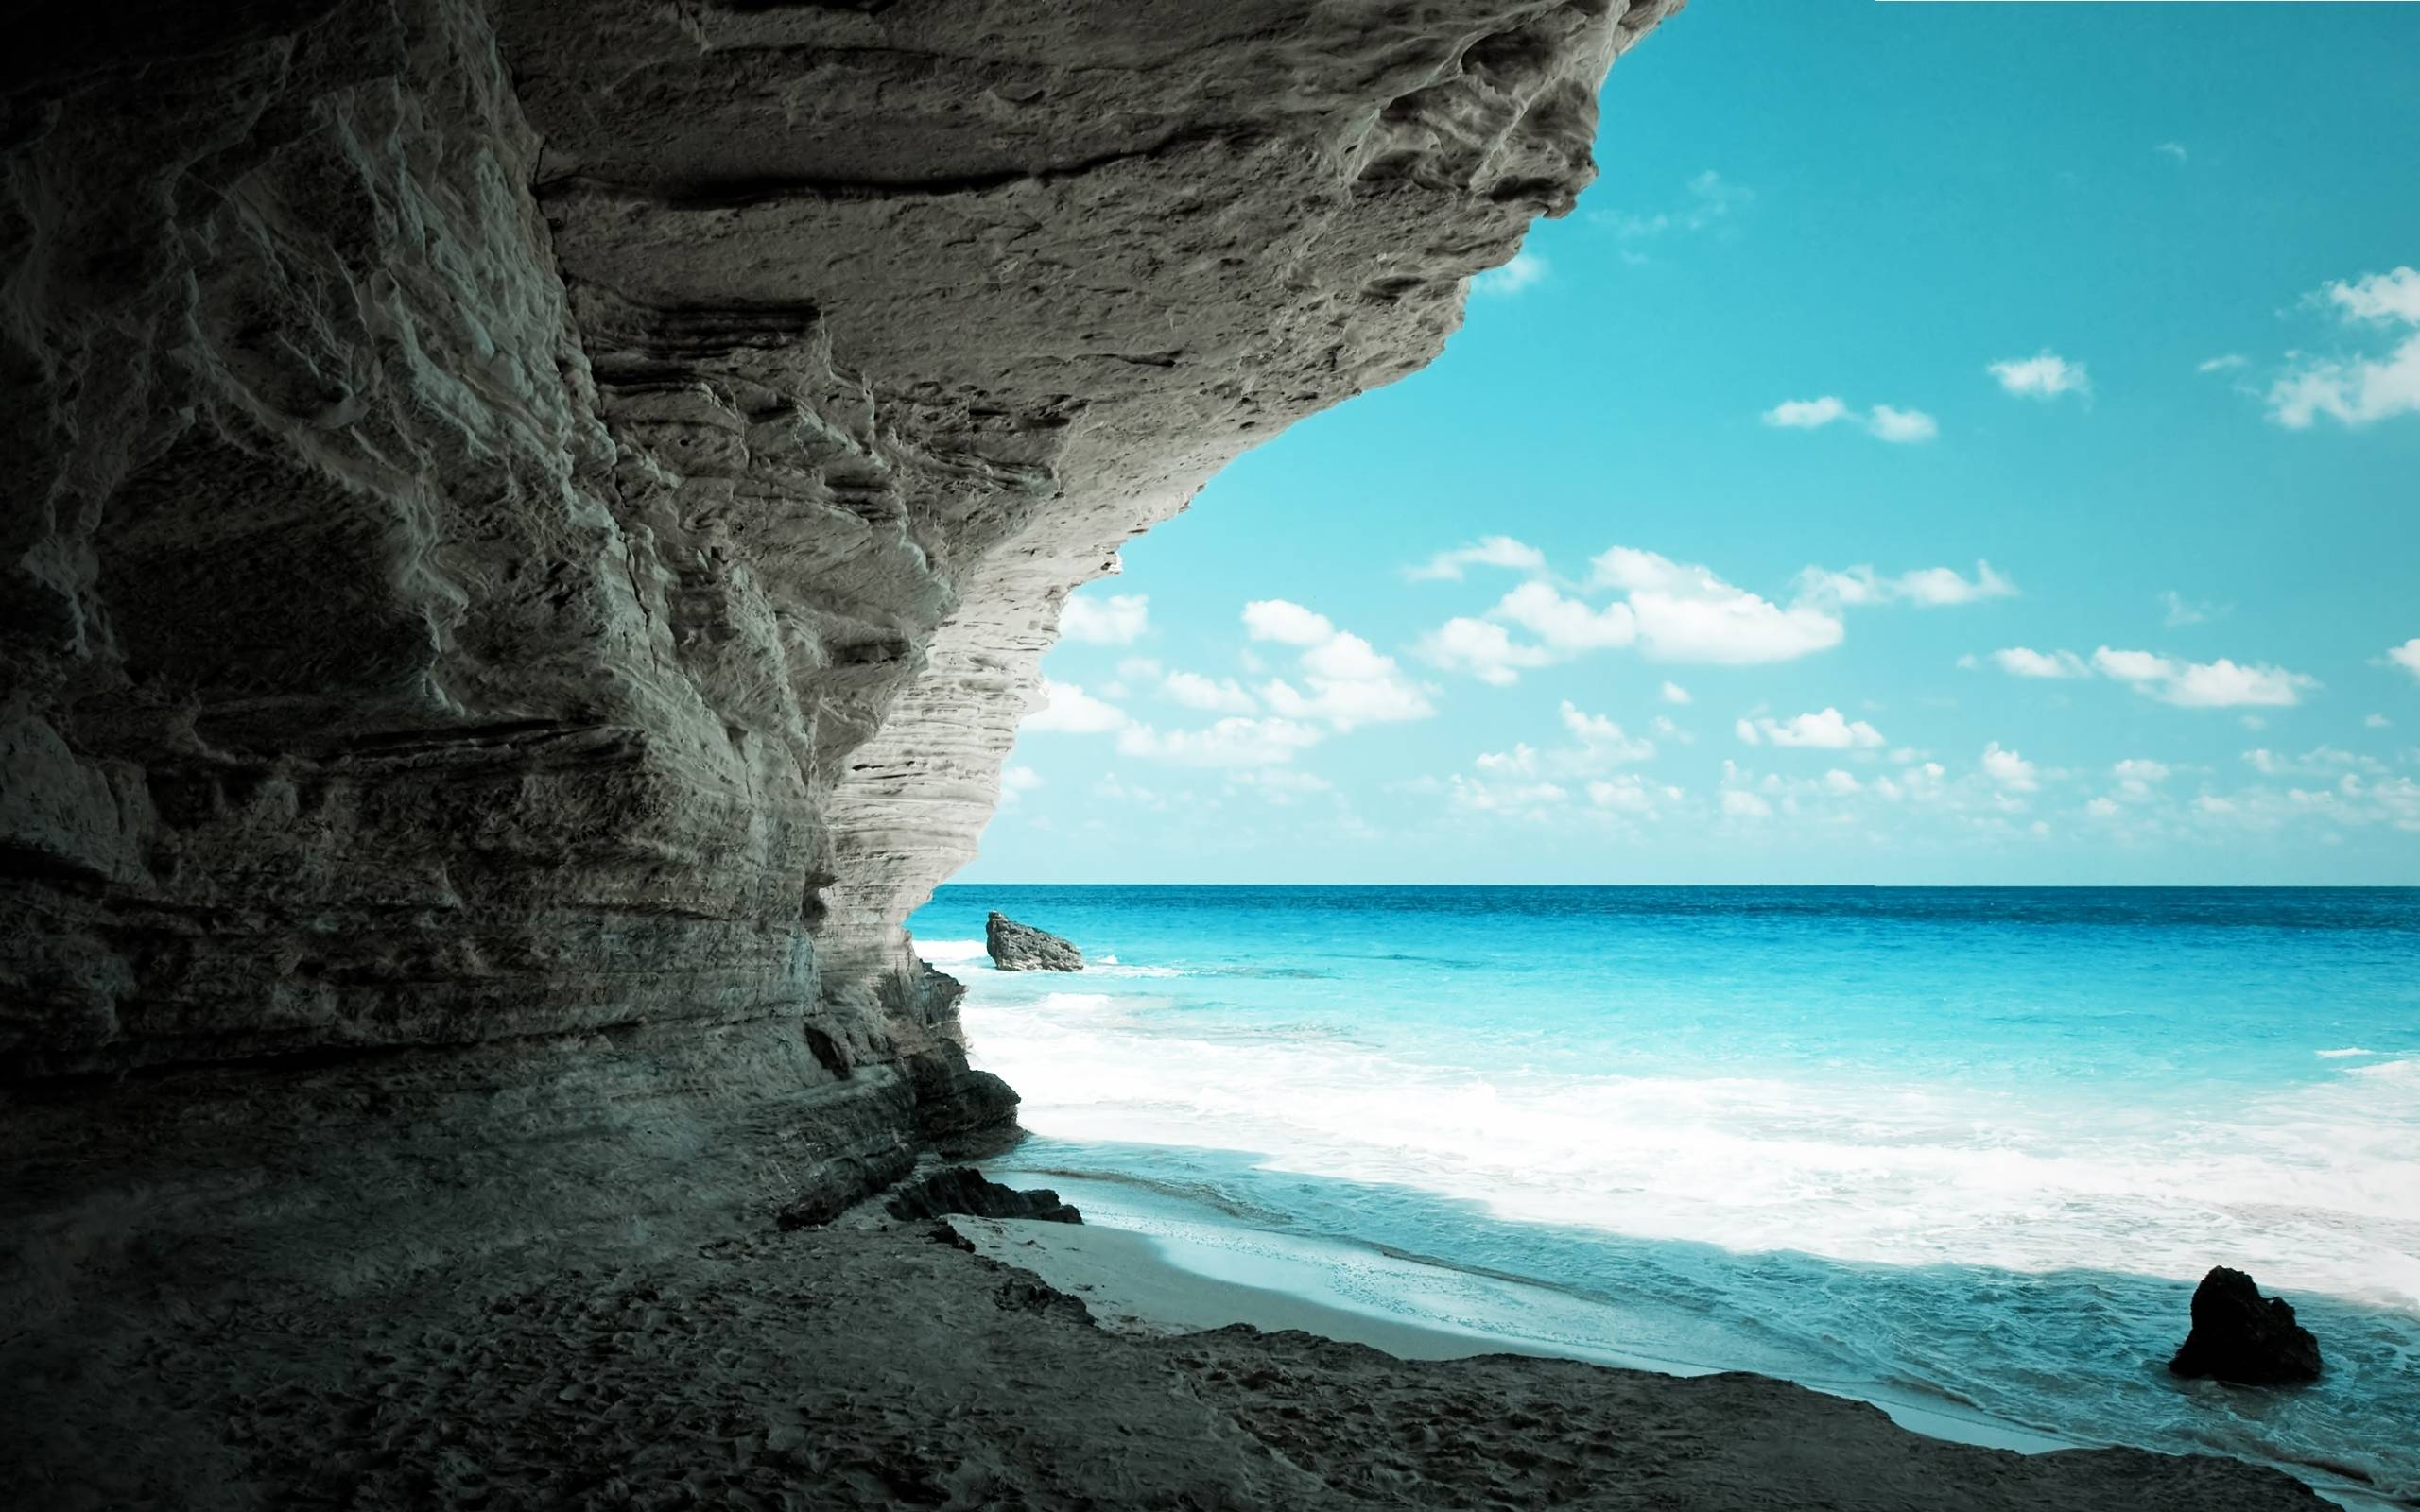 Summer Wallpapers HD - Wallpaper Cave